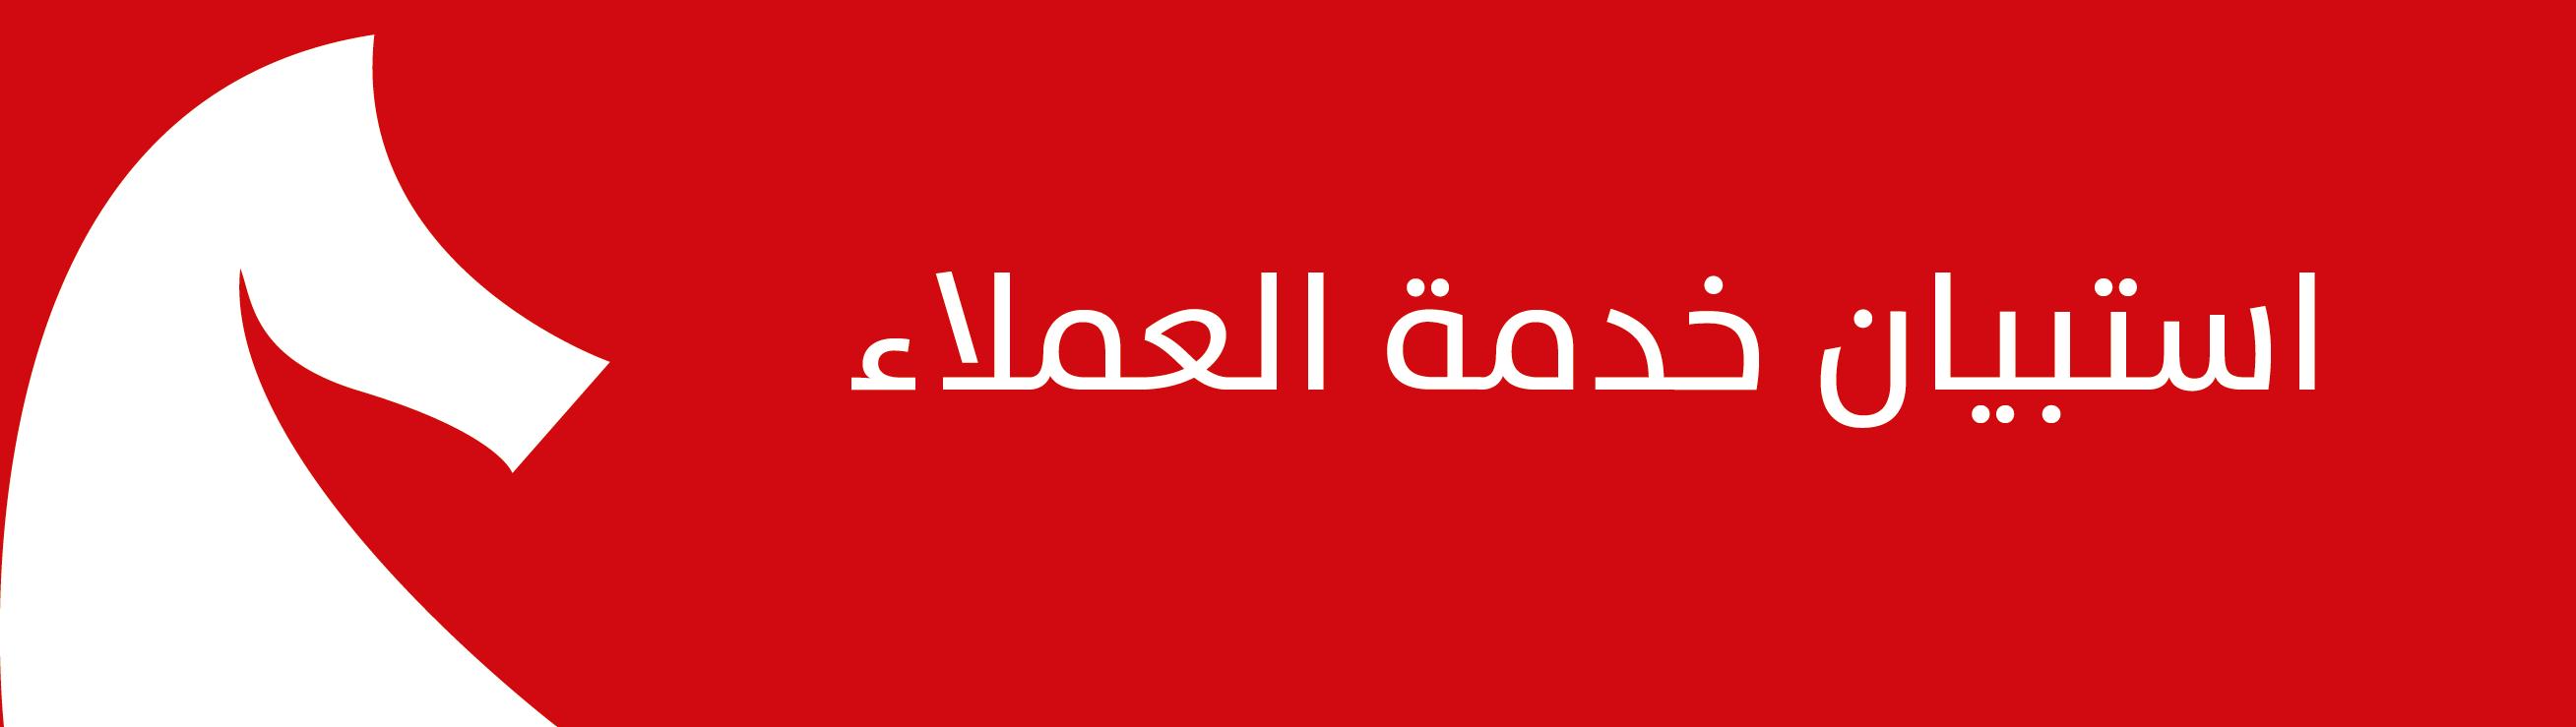 rd banner form -03